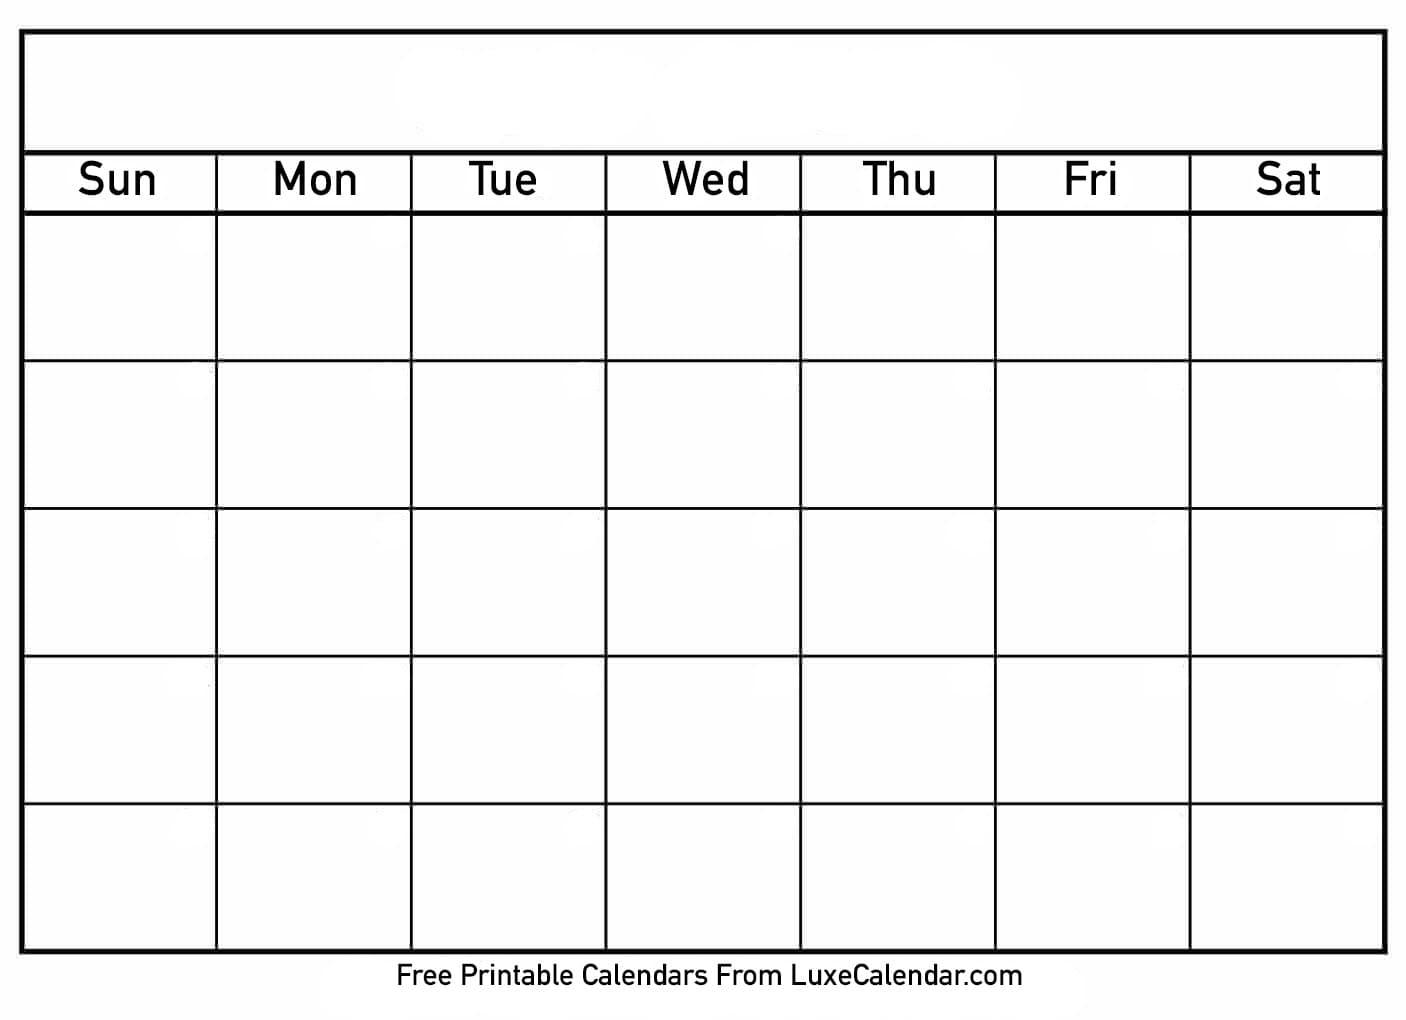 Blank Printable Calendar - Luxe Calendar intended for Blank Calendar Printable December Template